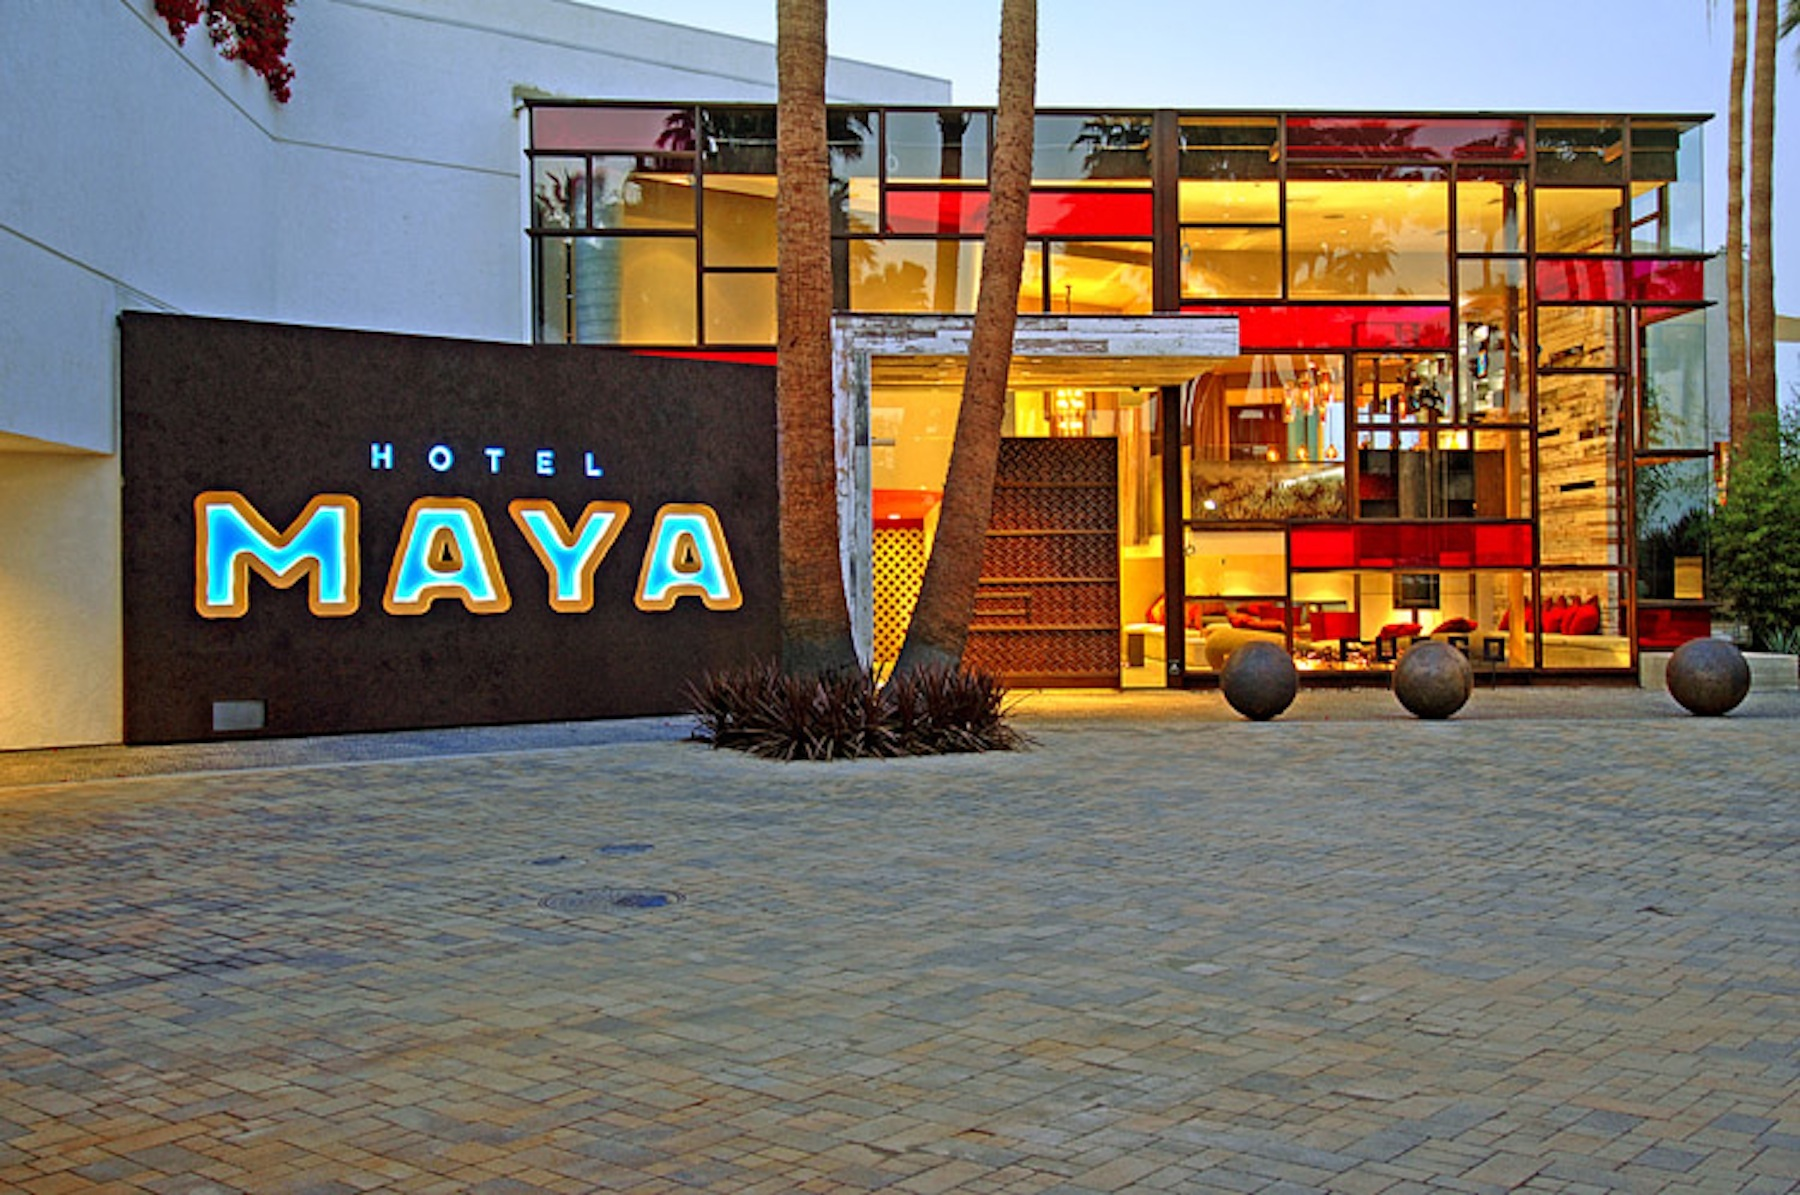 Hotel Maya Is A Hidden Gem In Long